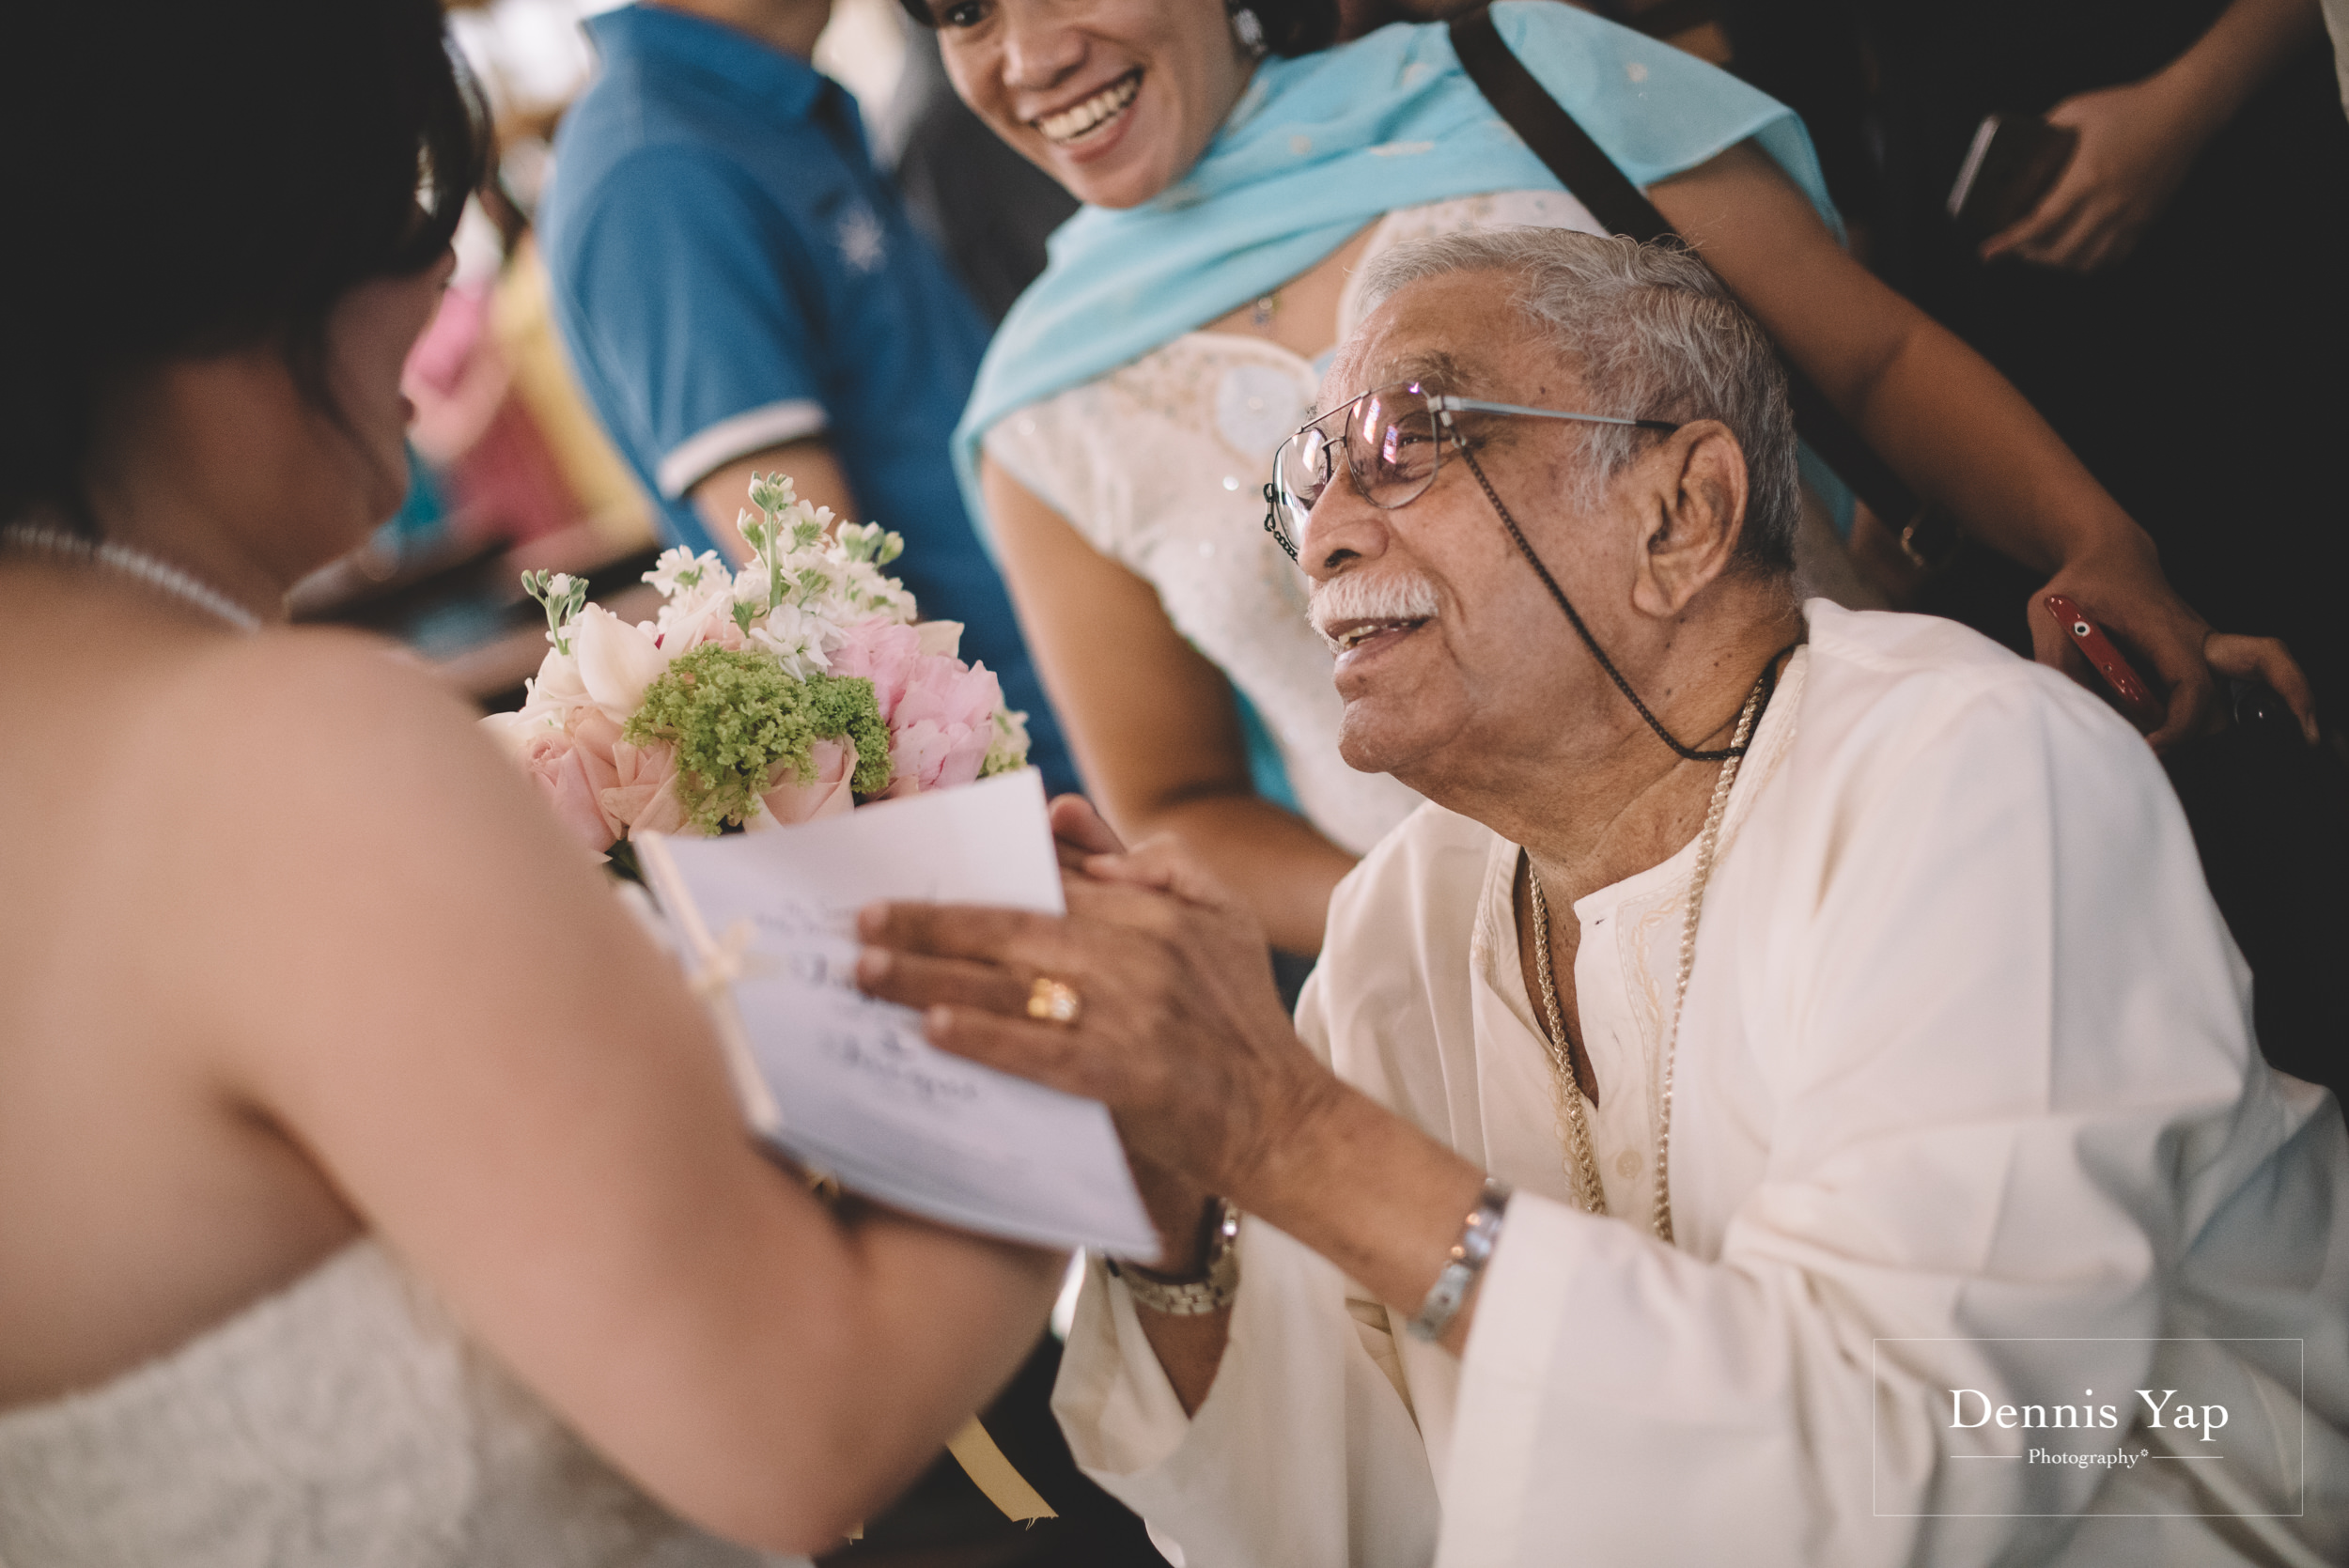 jinhan jacqui church wedding xavier catholic dennis yap photography malaysia wedding photographer-22.jpg